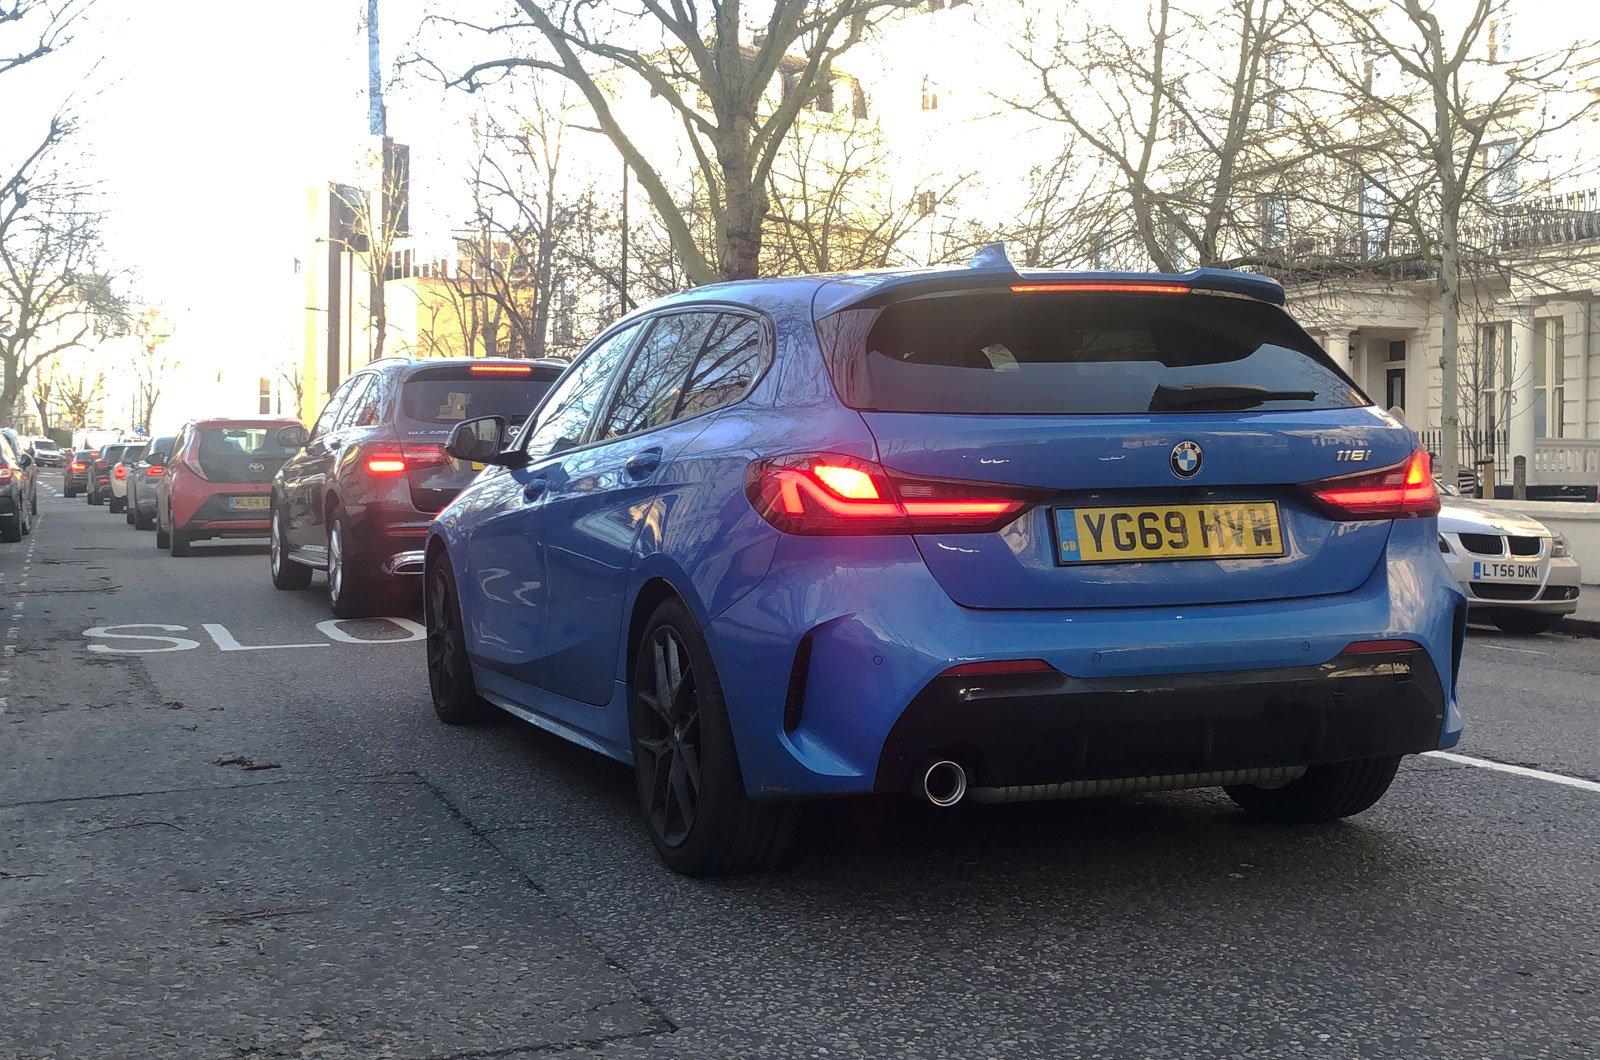 BMW 1 Series in traffic